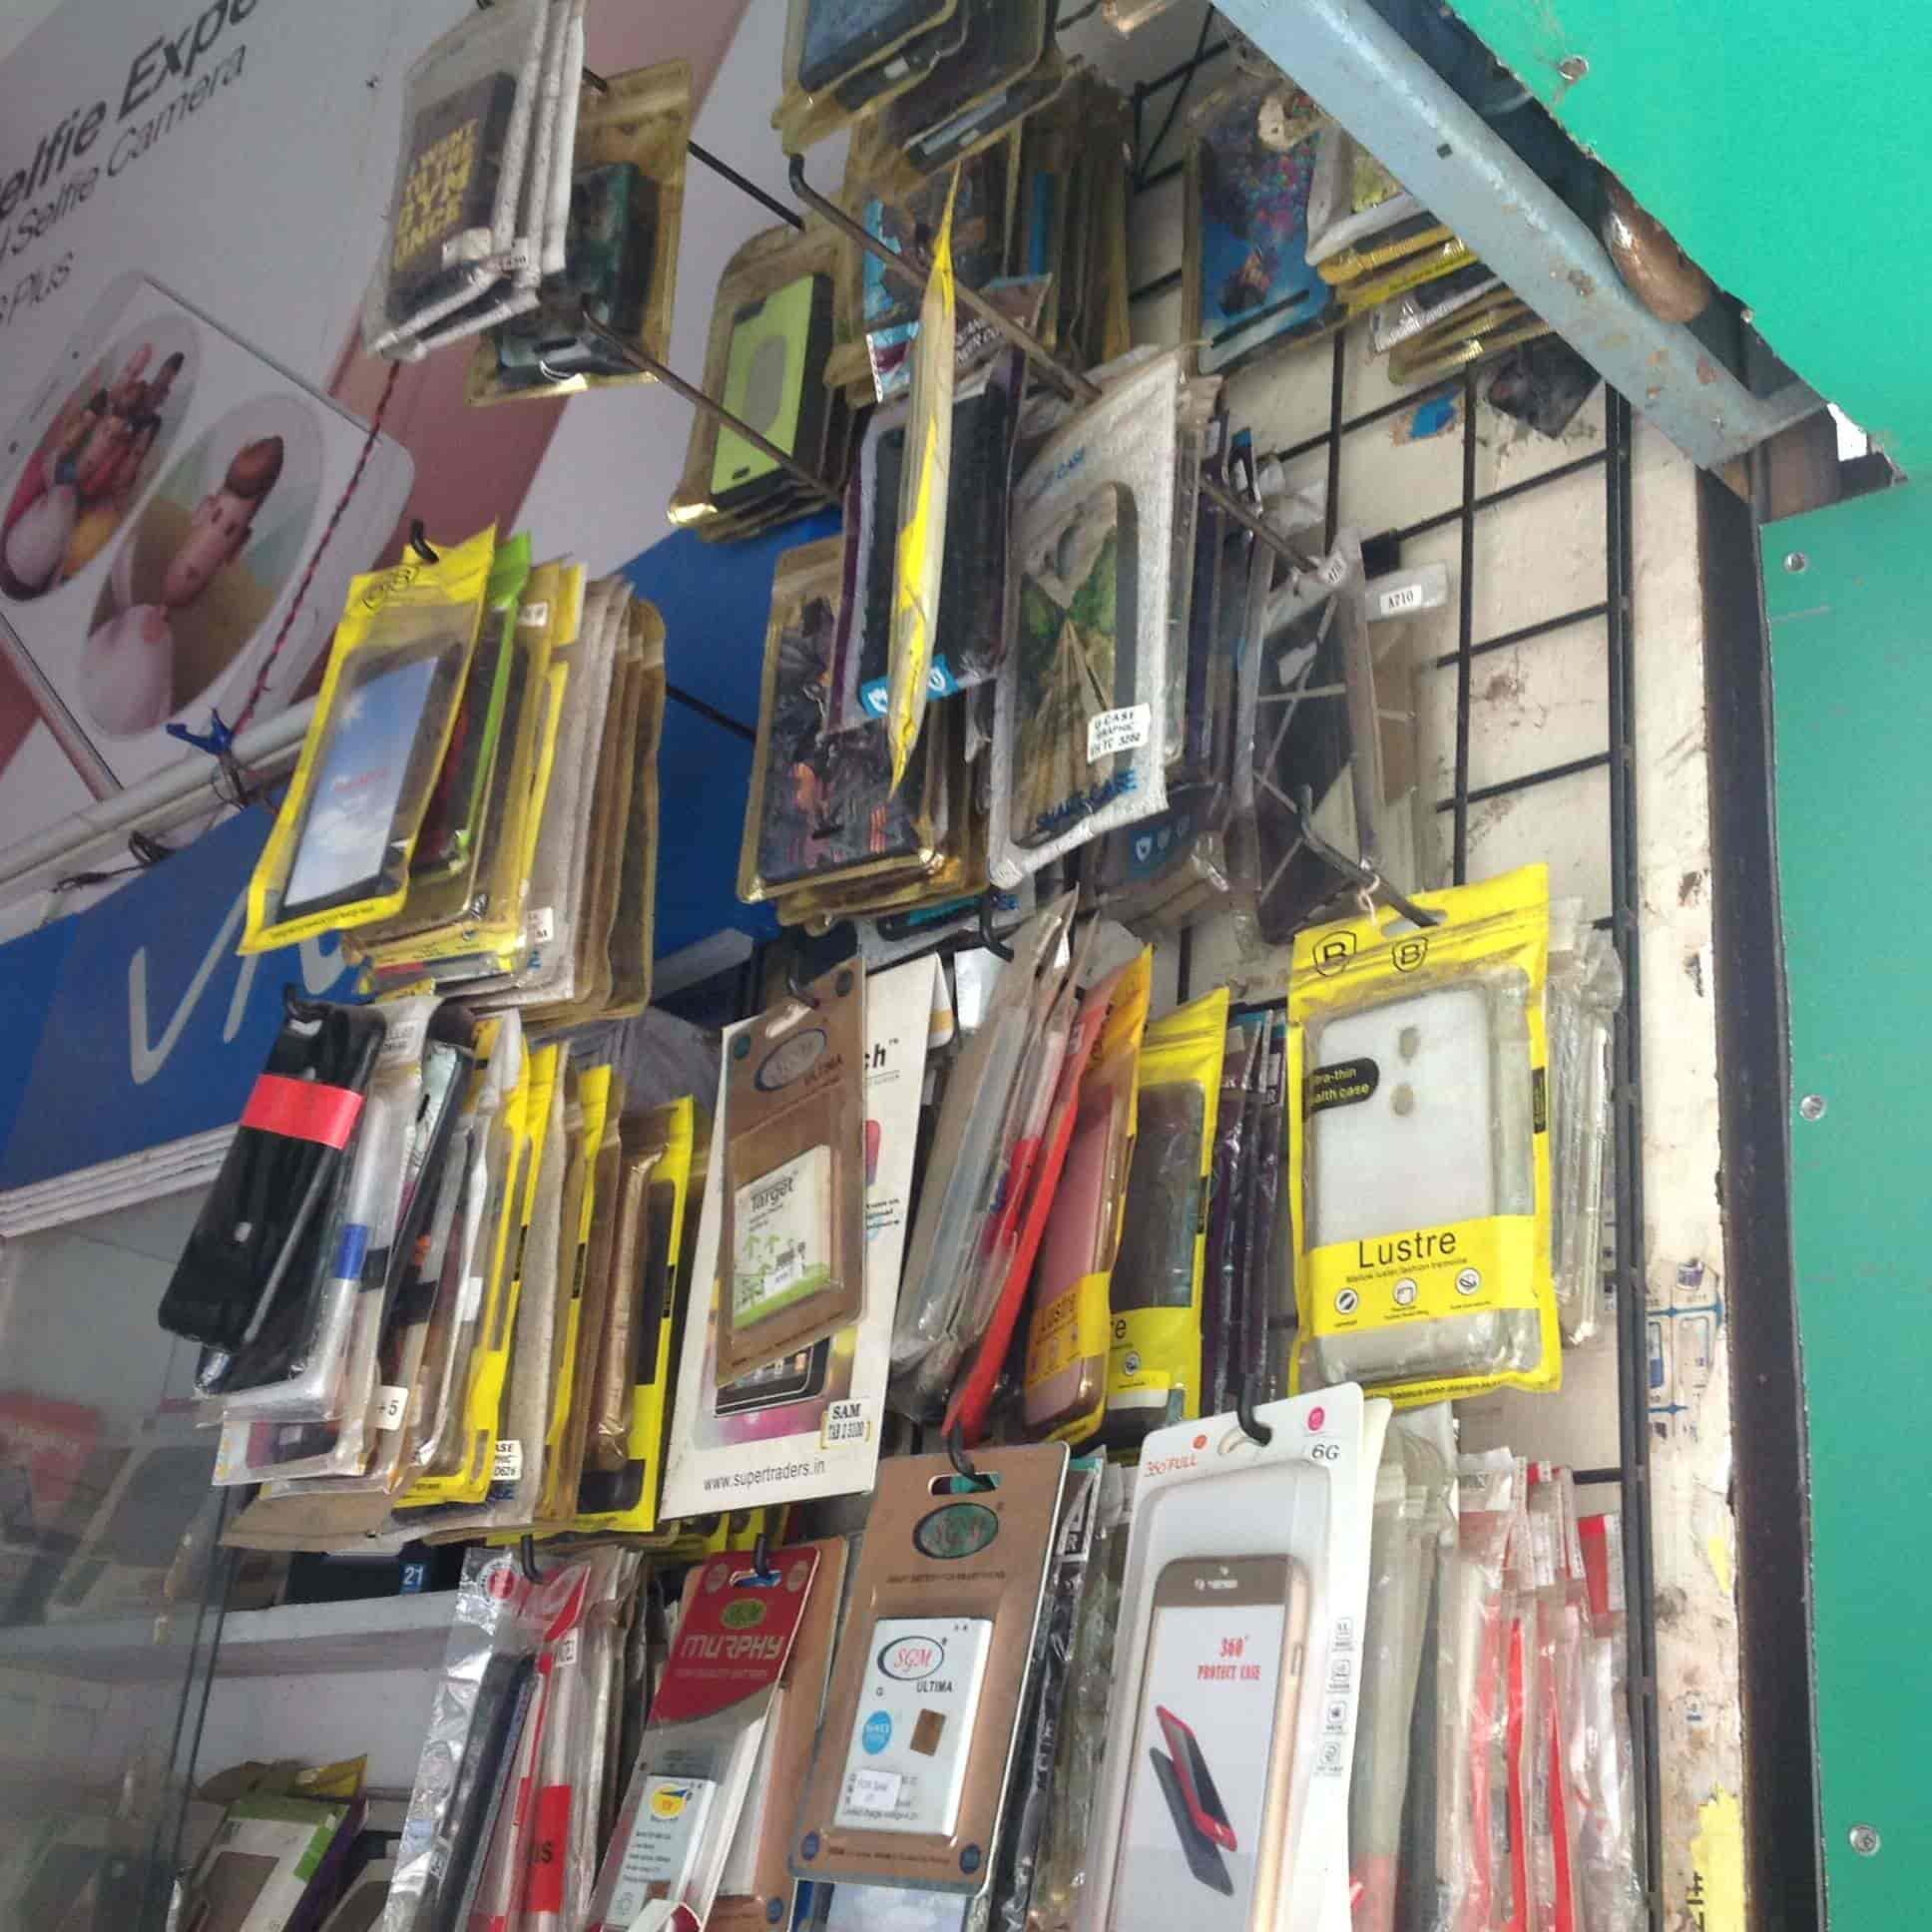 d83697a10f ... Suraj Mobile Shop Photos, Kamothe, Mumbai - Mobile Phone Repair &  Services ...